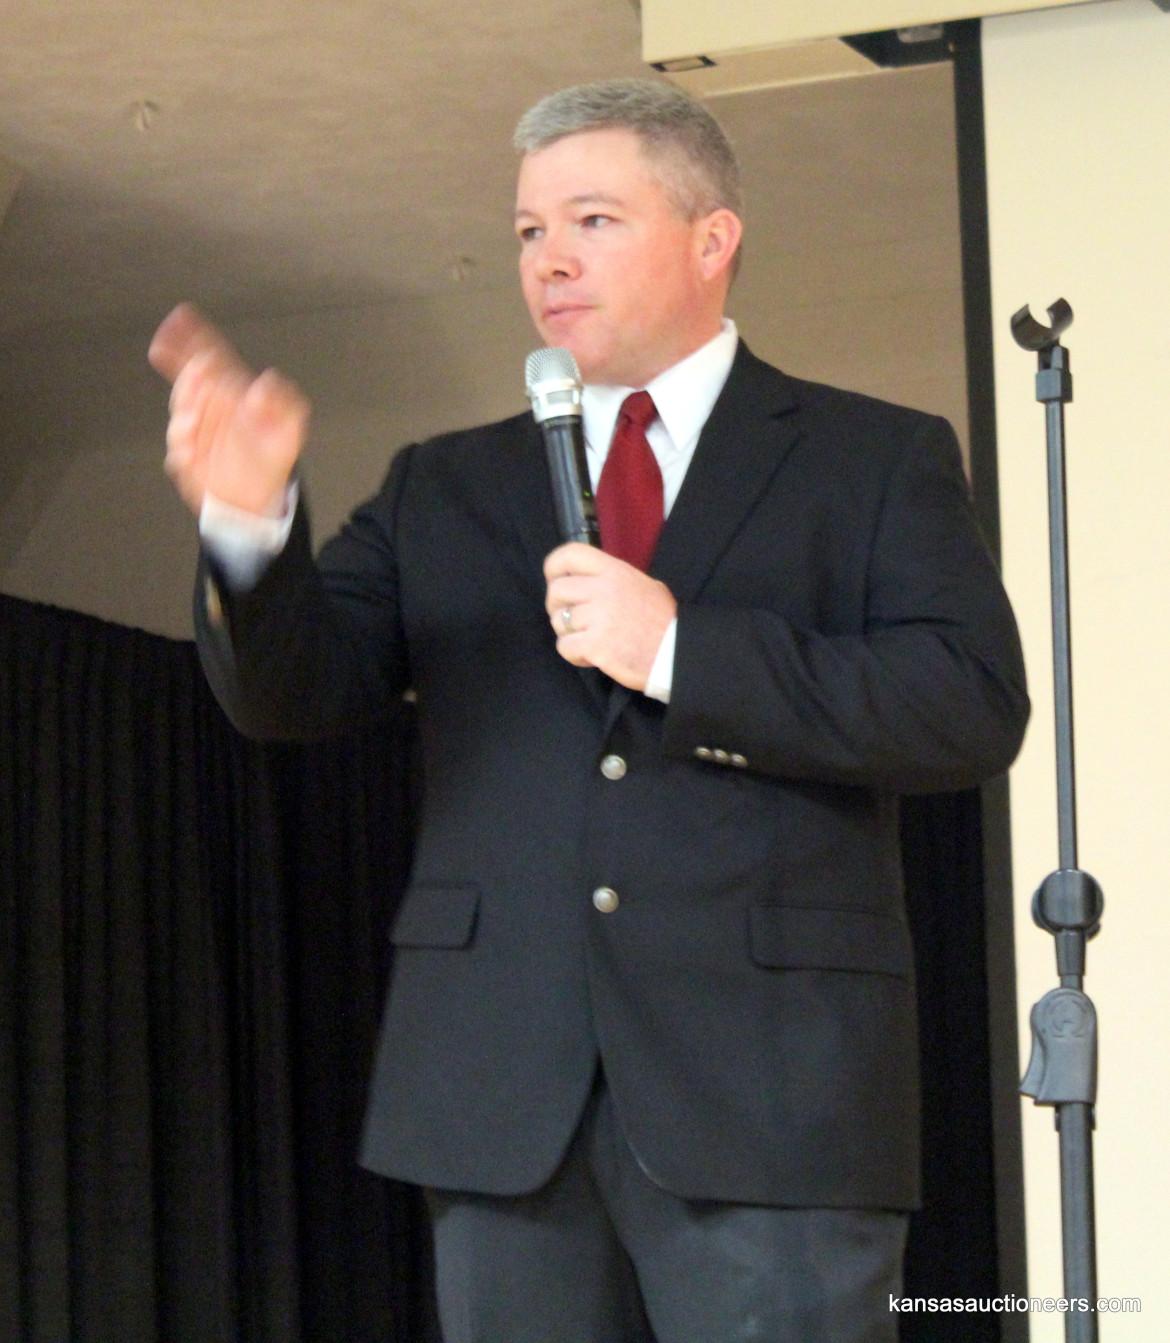 Brad Sosebee competing in the 2016 Kansas Auctioneer Preliminaries.